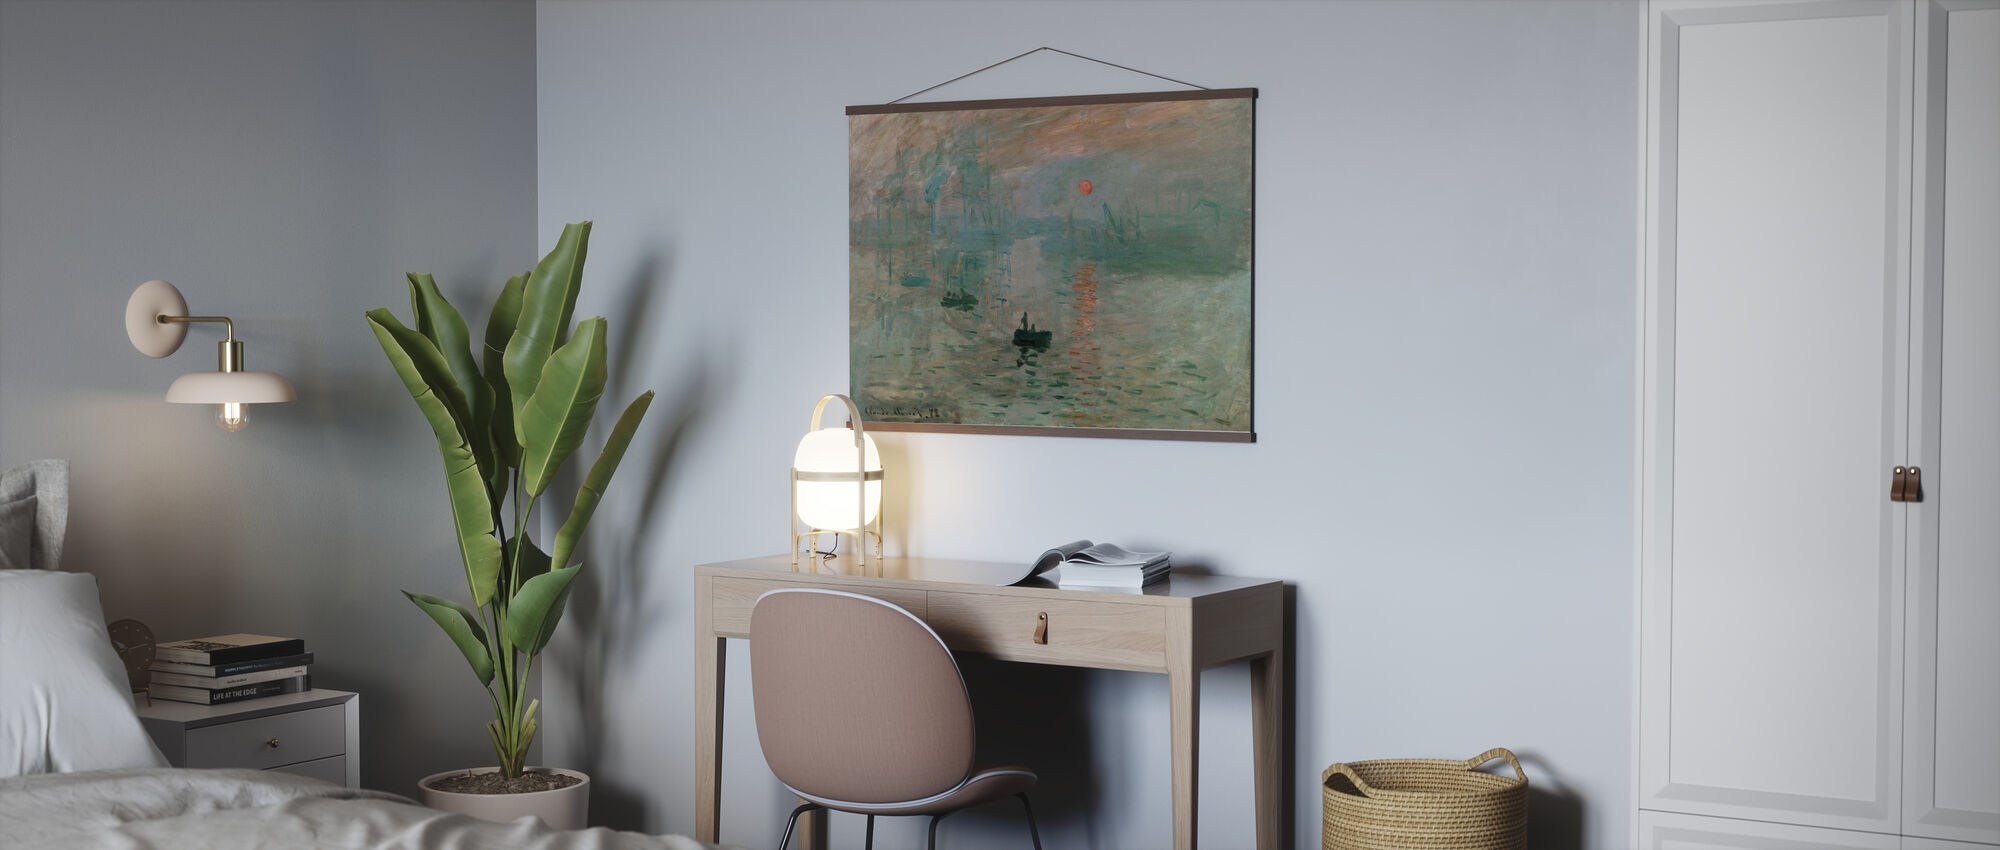 Monet, Claud - Inntrykk - Plakat - Kontor